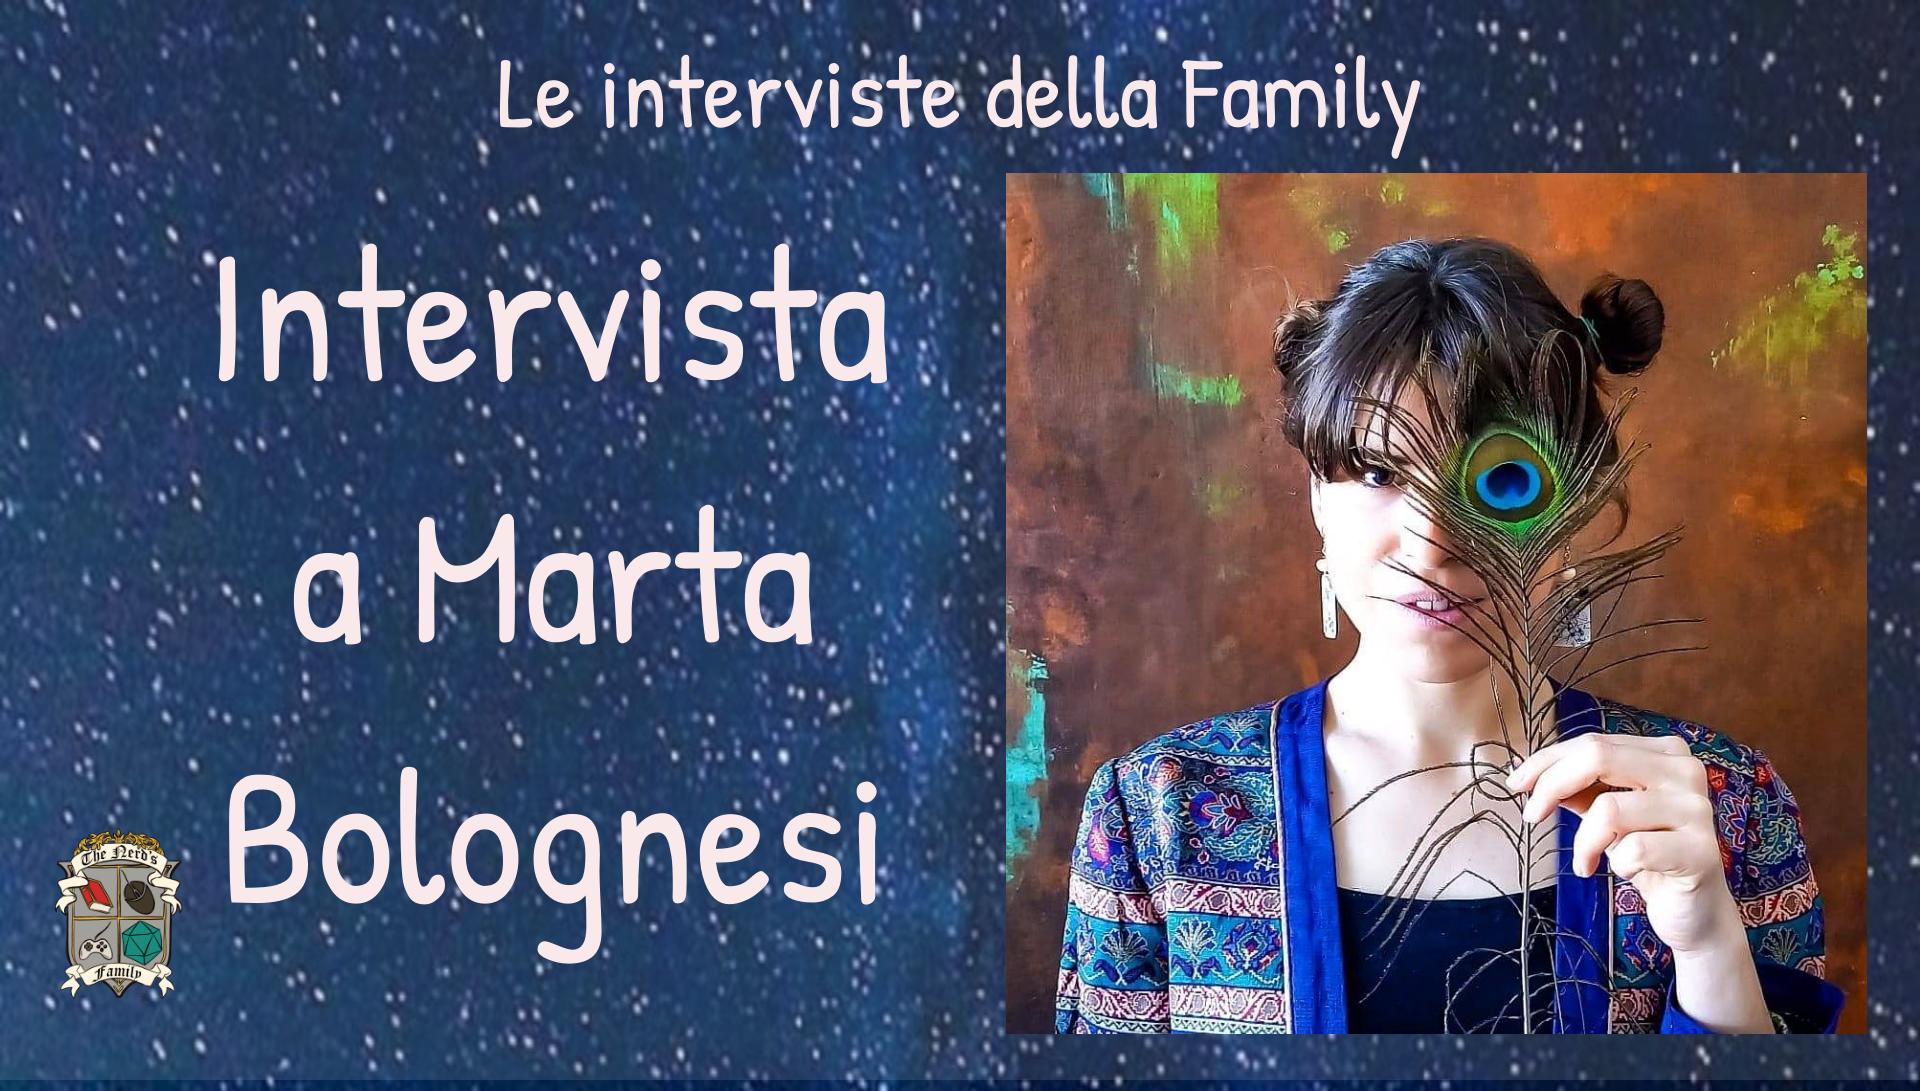 Marta Bolognesi